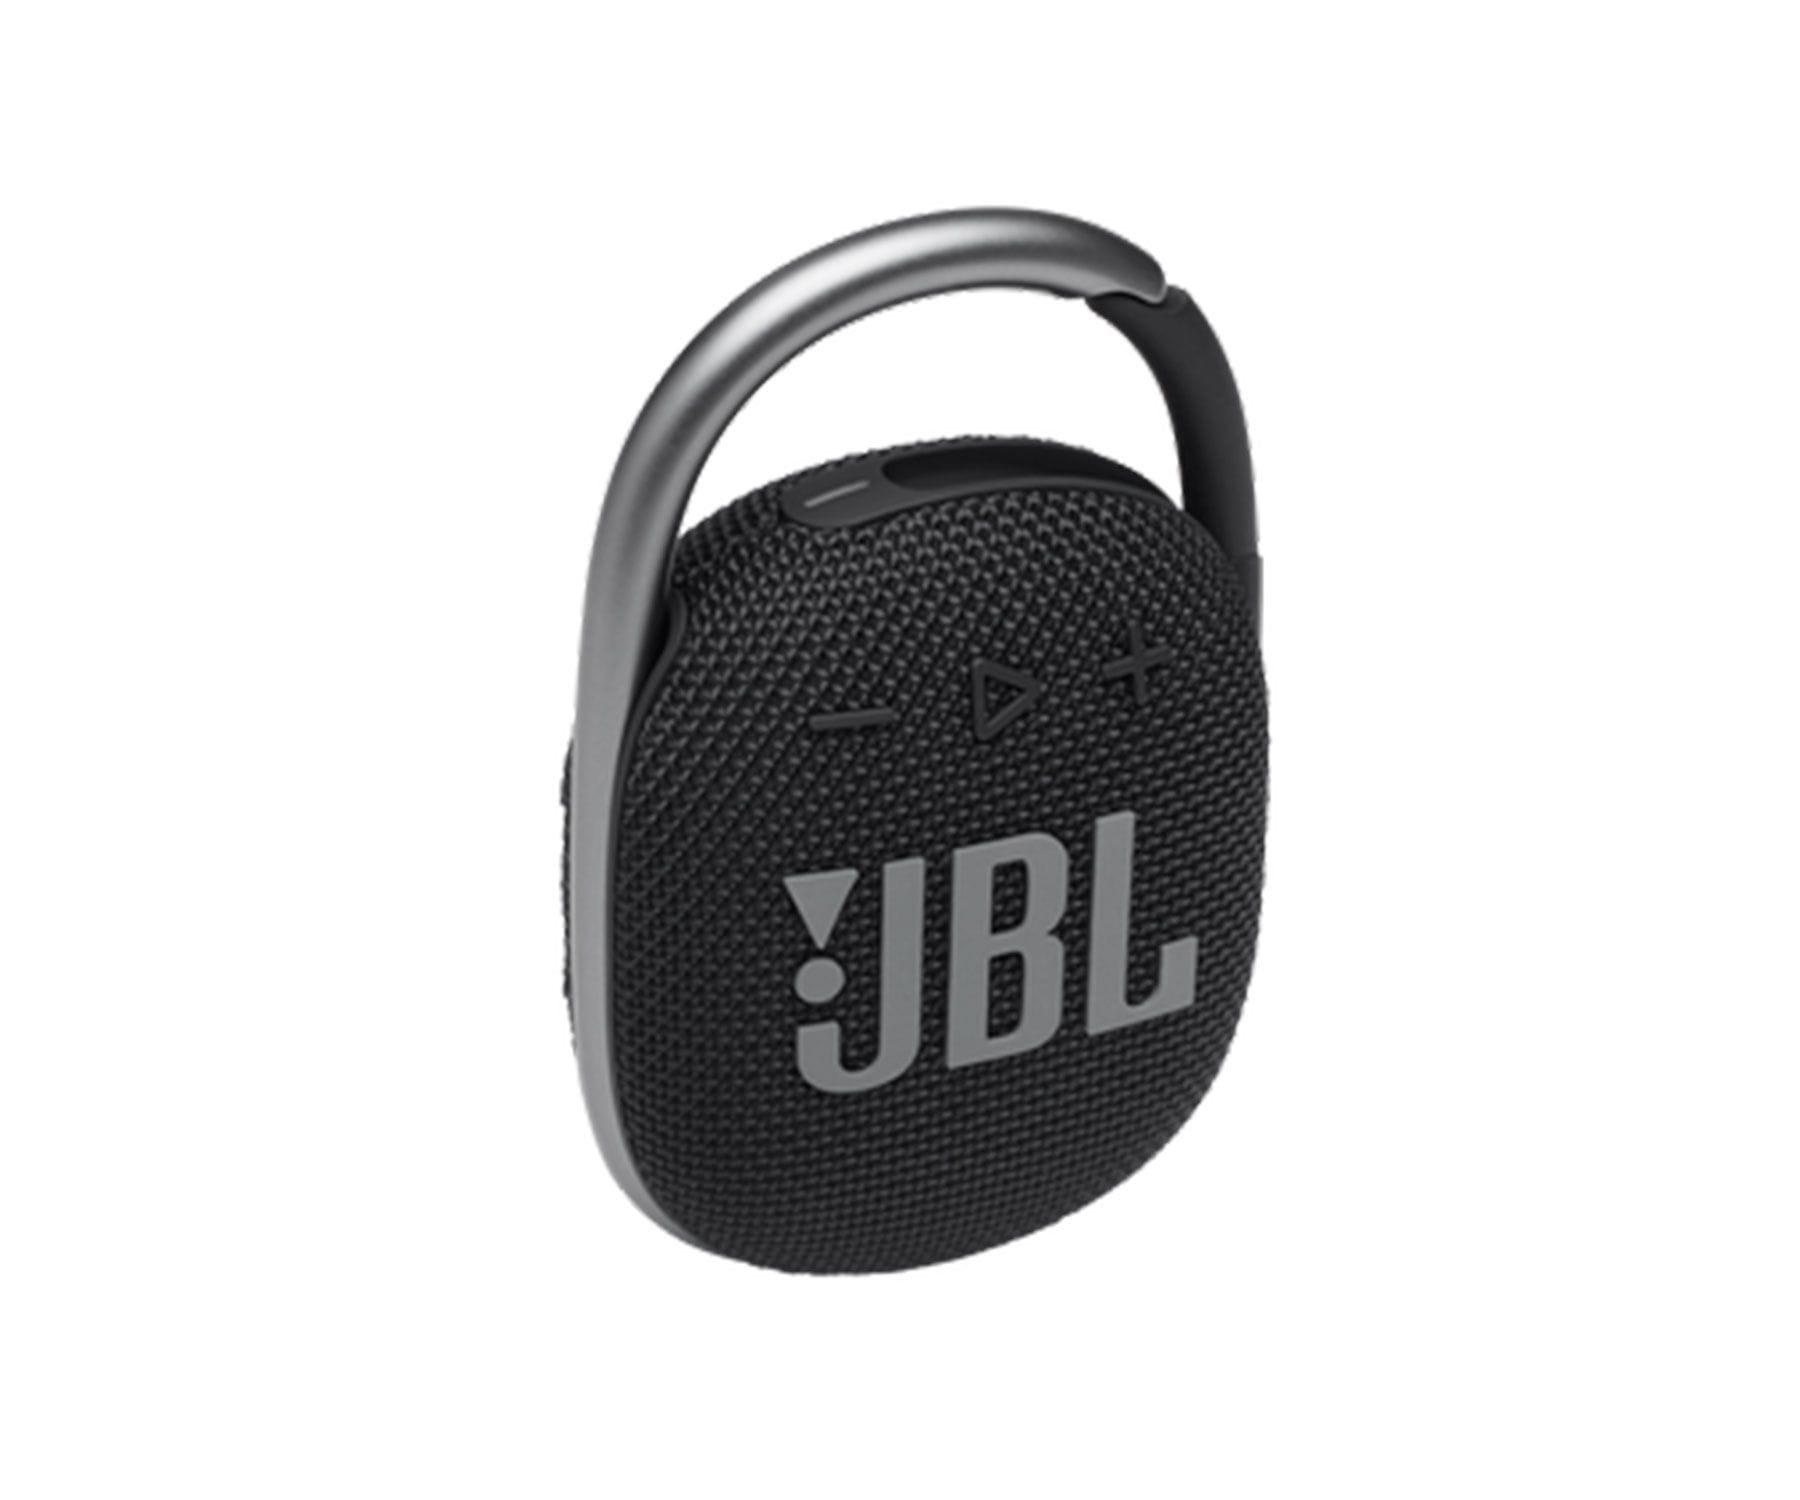 Jbl Altavoz Clip4 Negro/Bluetooth 5.1/IP67/5W